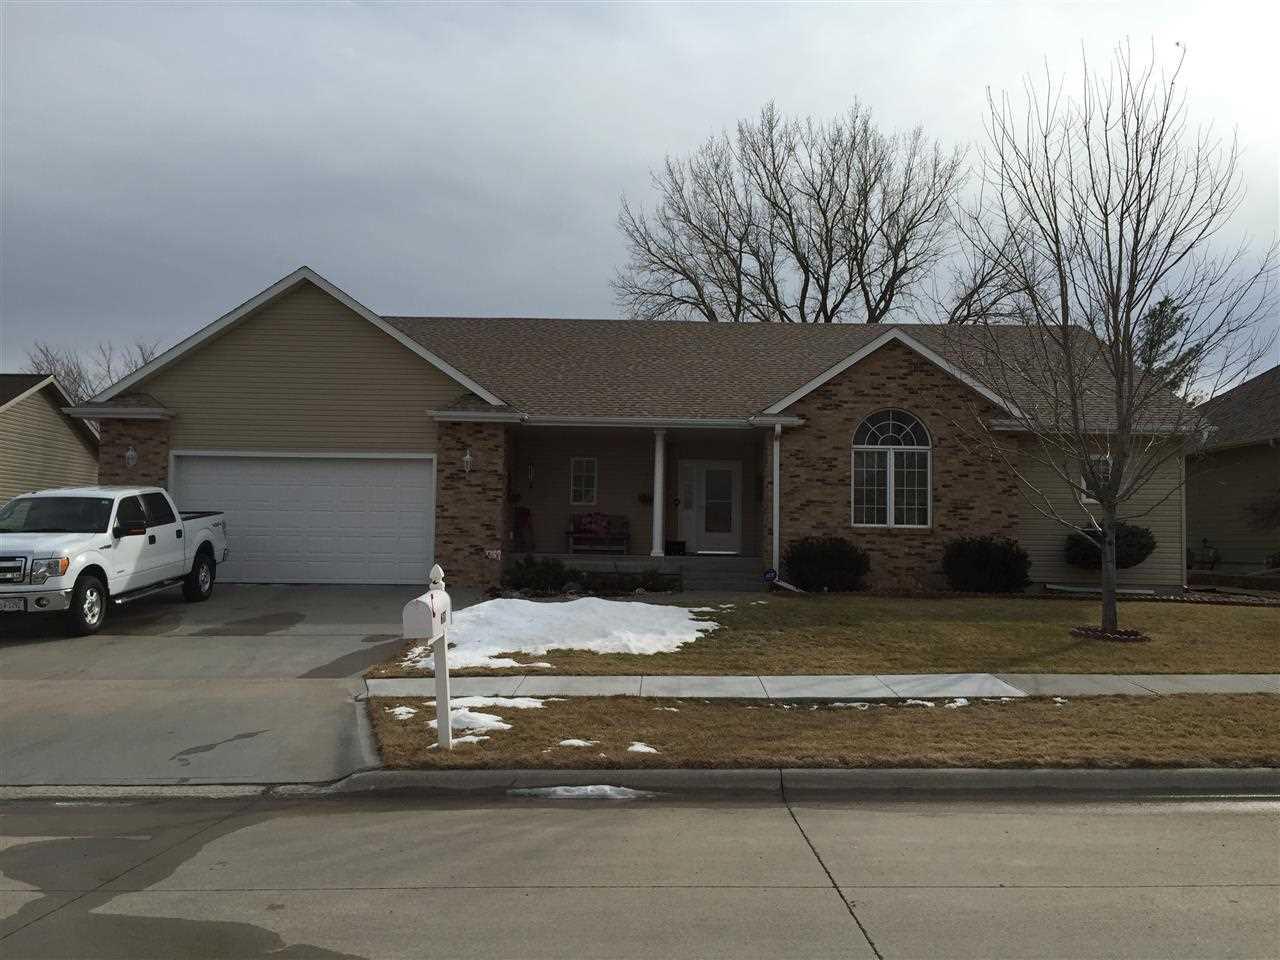 Real Estate for Sale, ListingId: 31842859, Hastings,NE68901